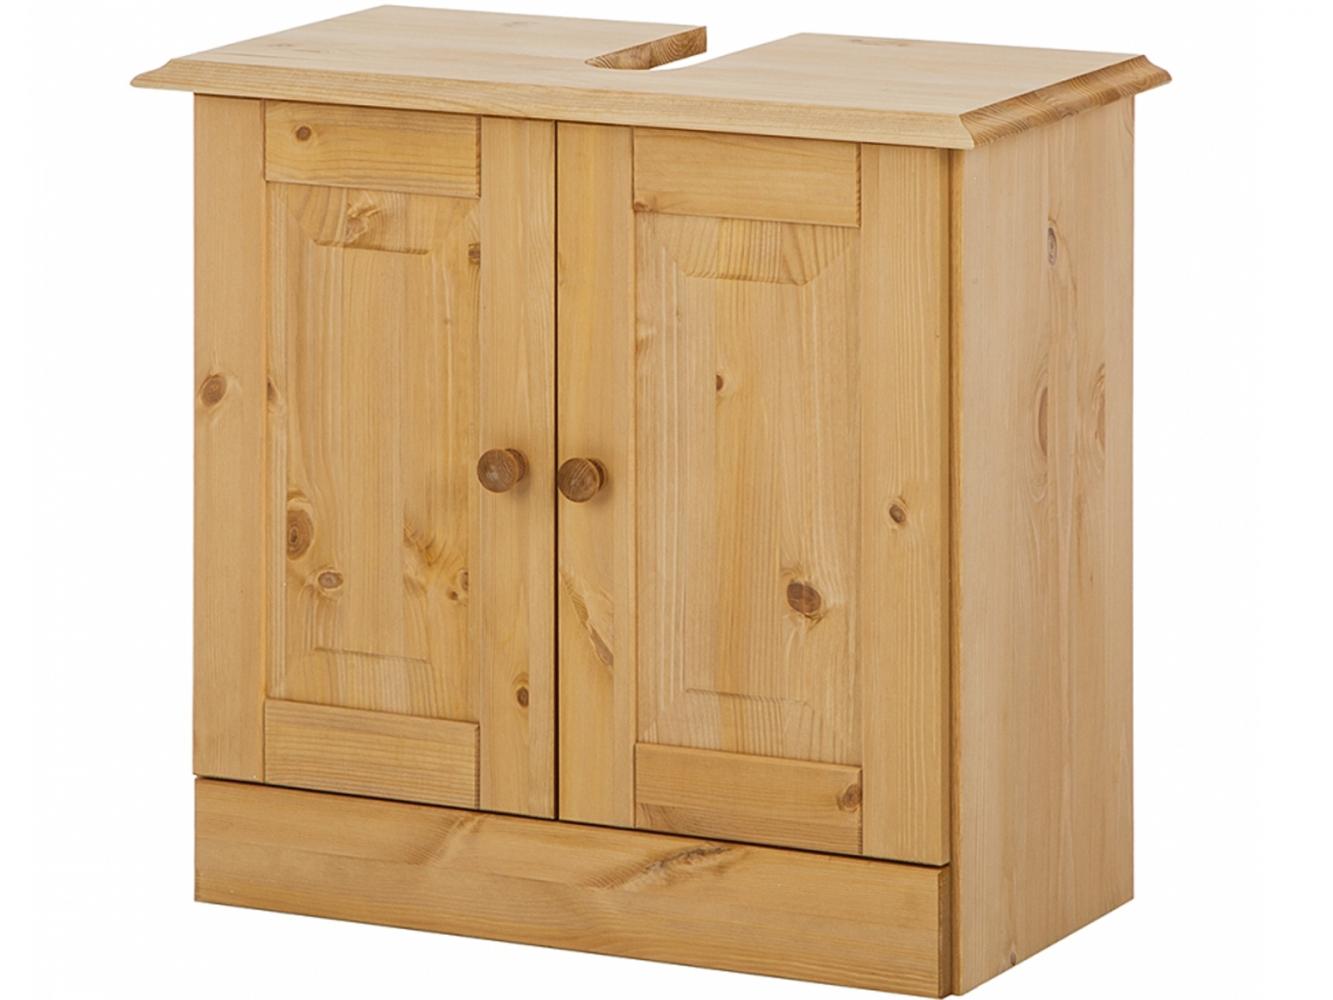 Umyvadlová skříňka Rocia, 60 cm, borovice